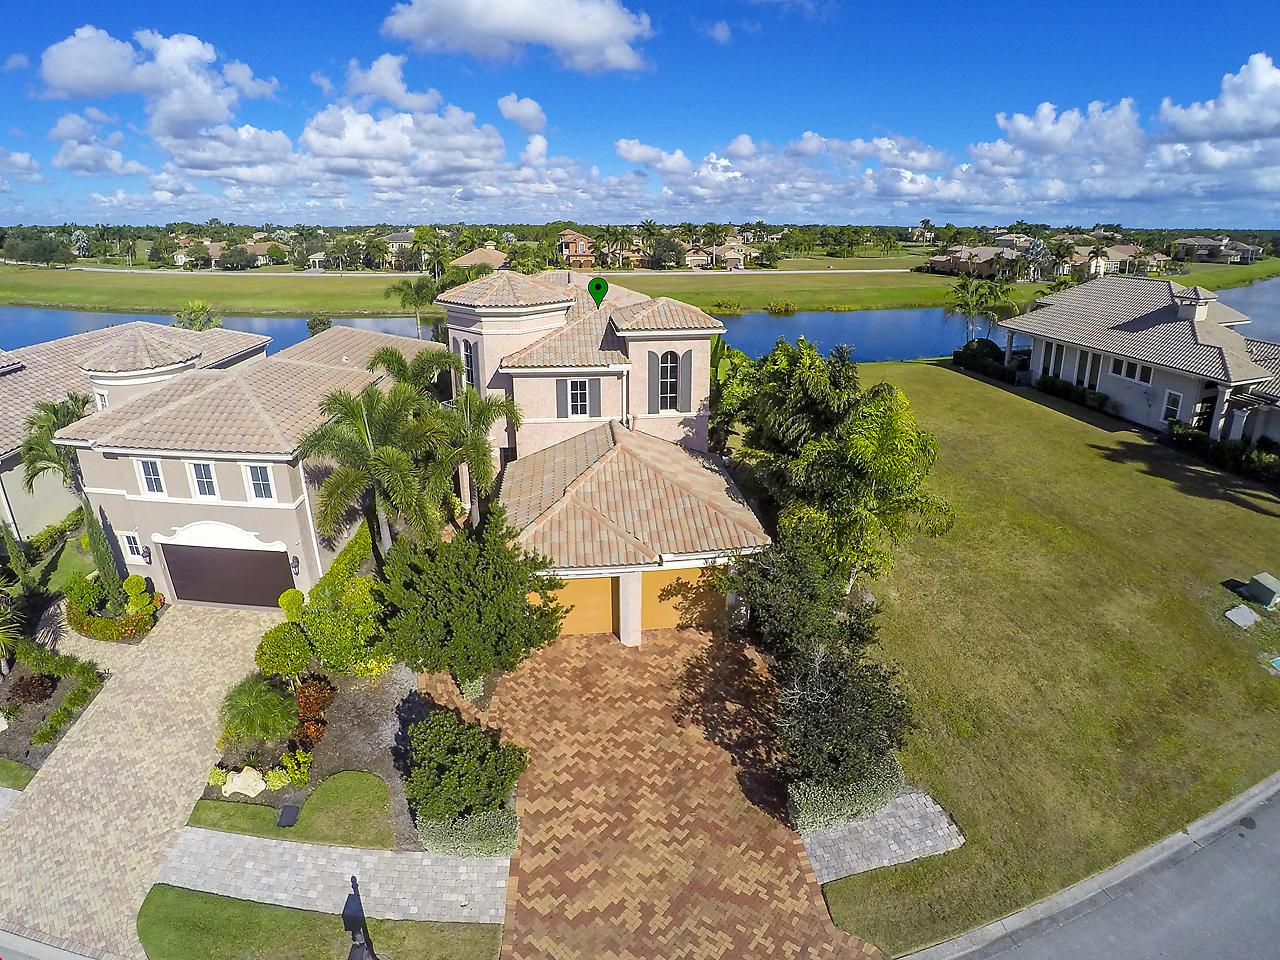 160 Santa Gardenia, Port Saint Lucie, Florida 34984, 3 Bedrooms Bedrooms, ,4 BathroomsBathrooms,Single Family,For Sale,Santa Gardenia,RX-10476863